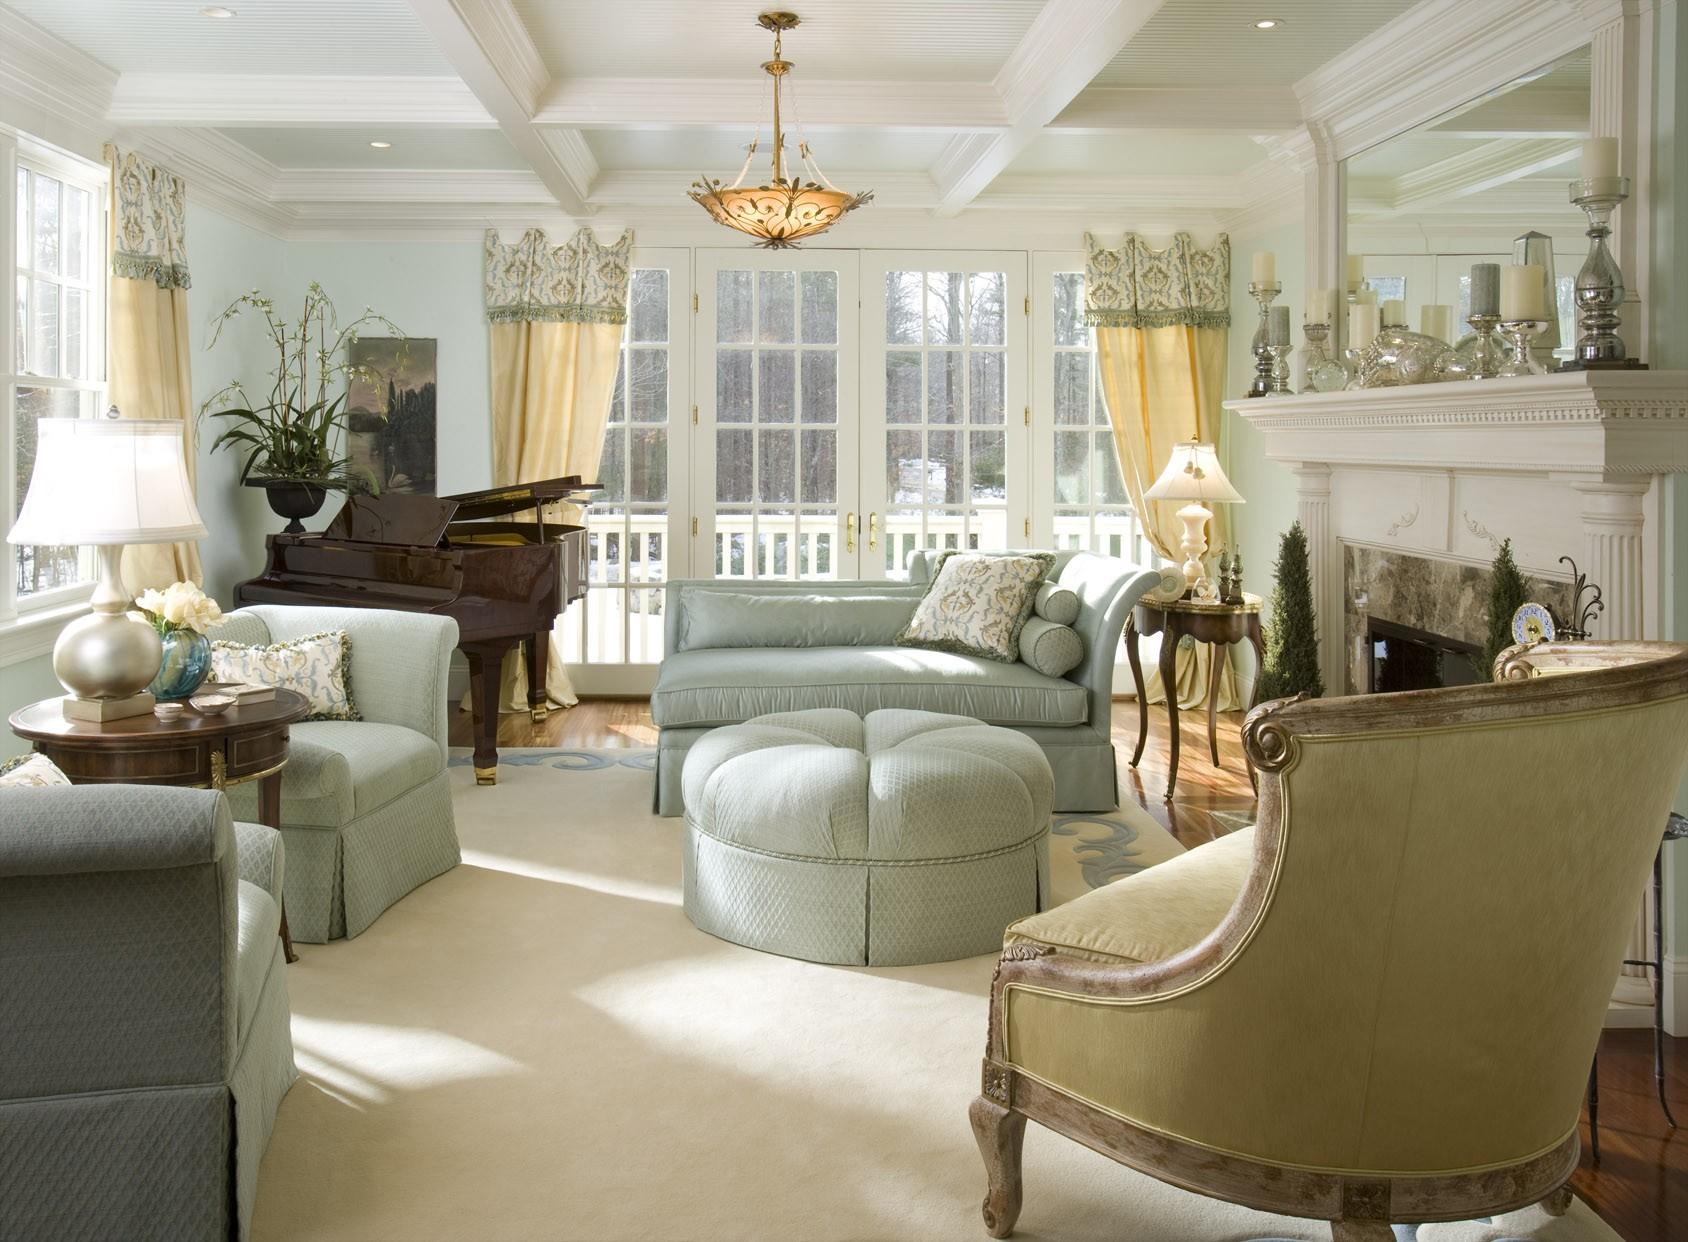 Modern Home Design Den Decorating Ideas